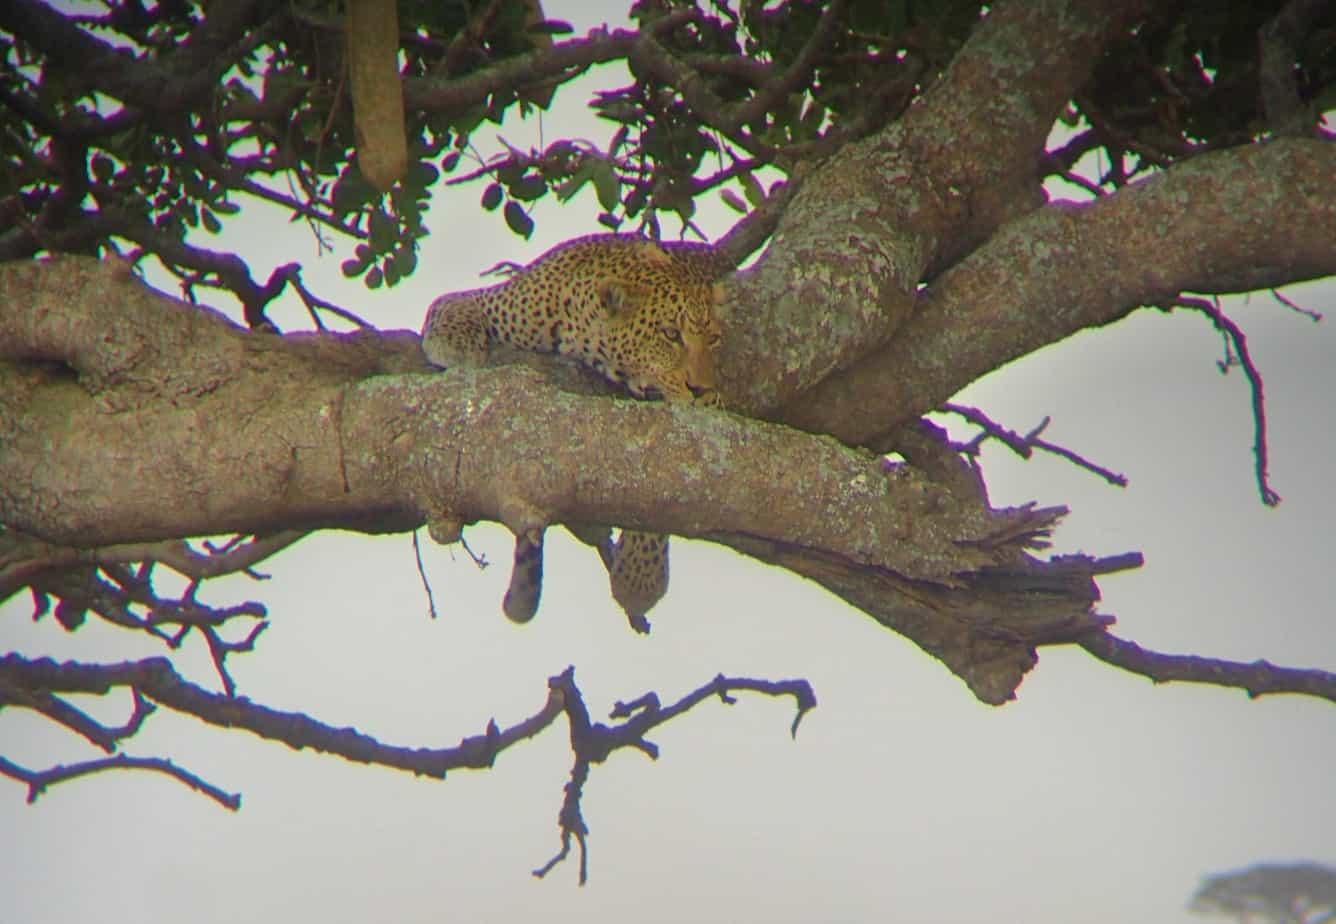 Leopard watching Zebra